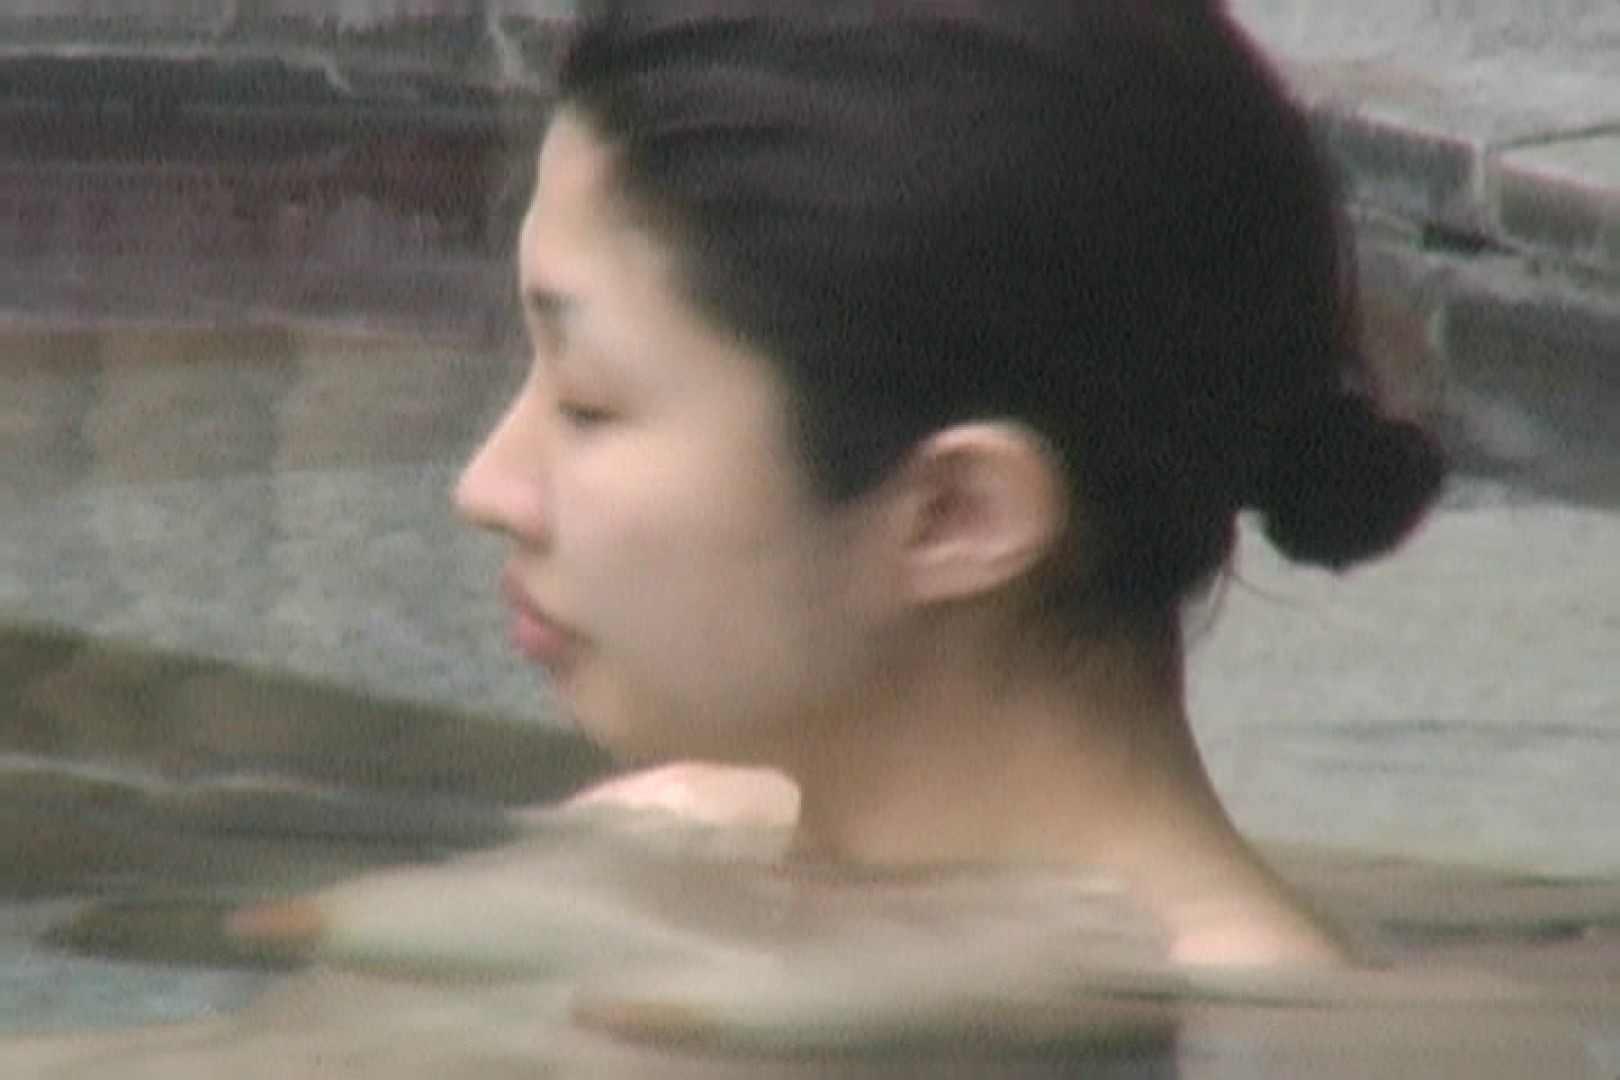 Aquaな露天風呂Vol.642 盗撮シリーズ   露天風呂編  92PIX 35